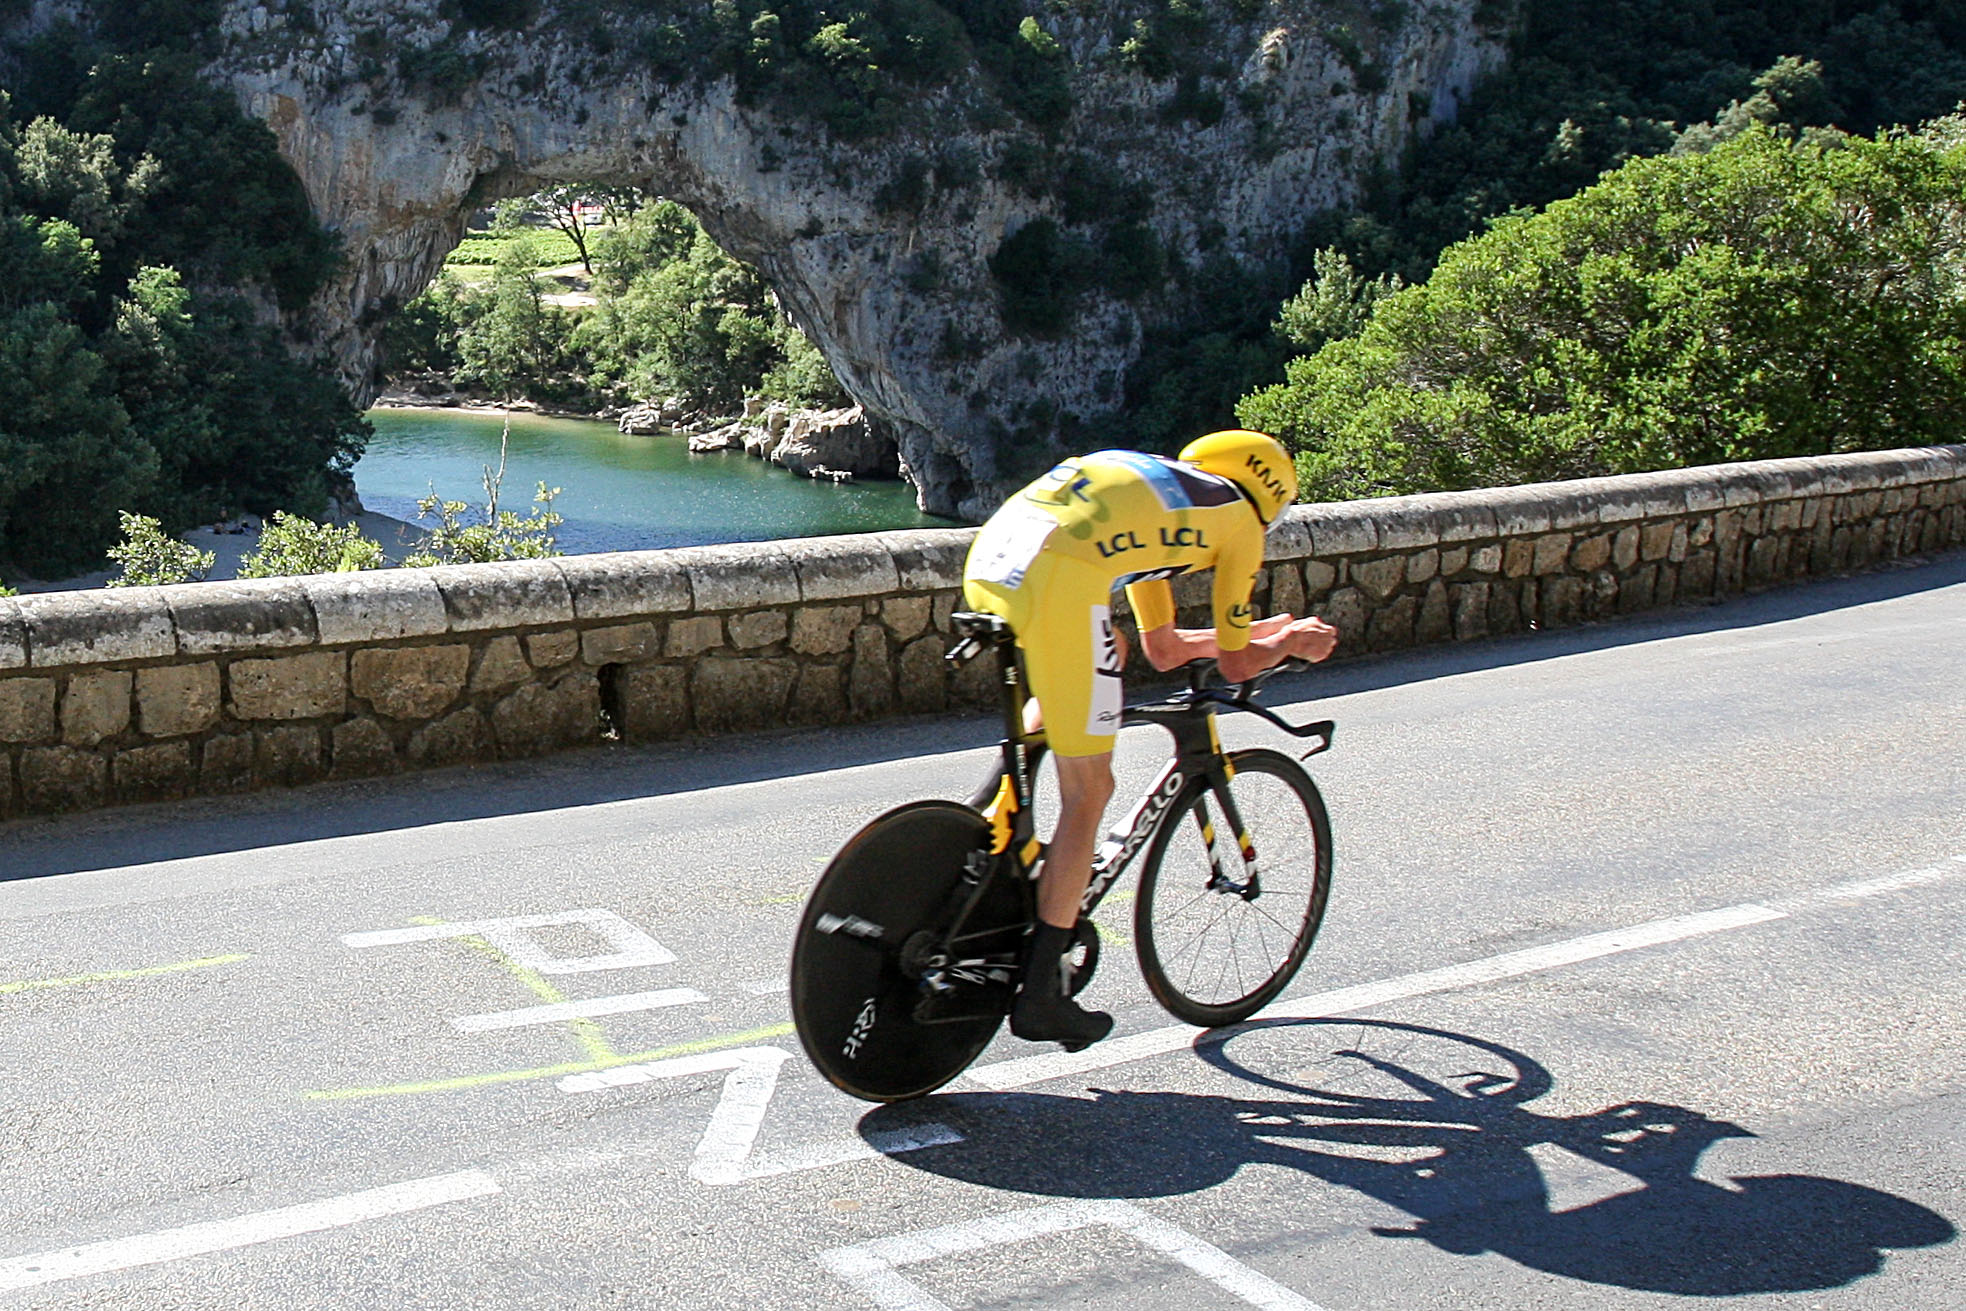 Icon Sport/Icon Sport via Getty Images